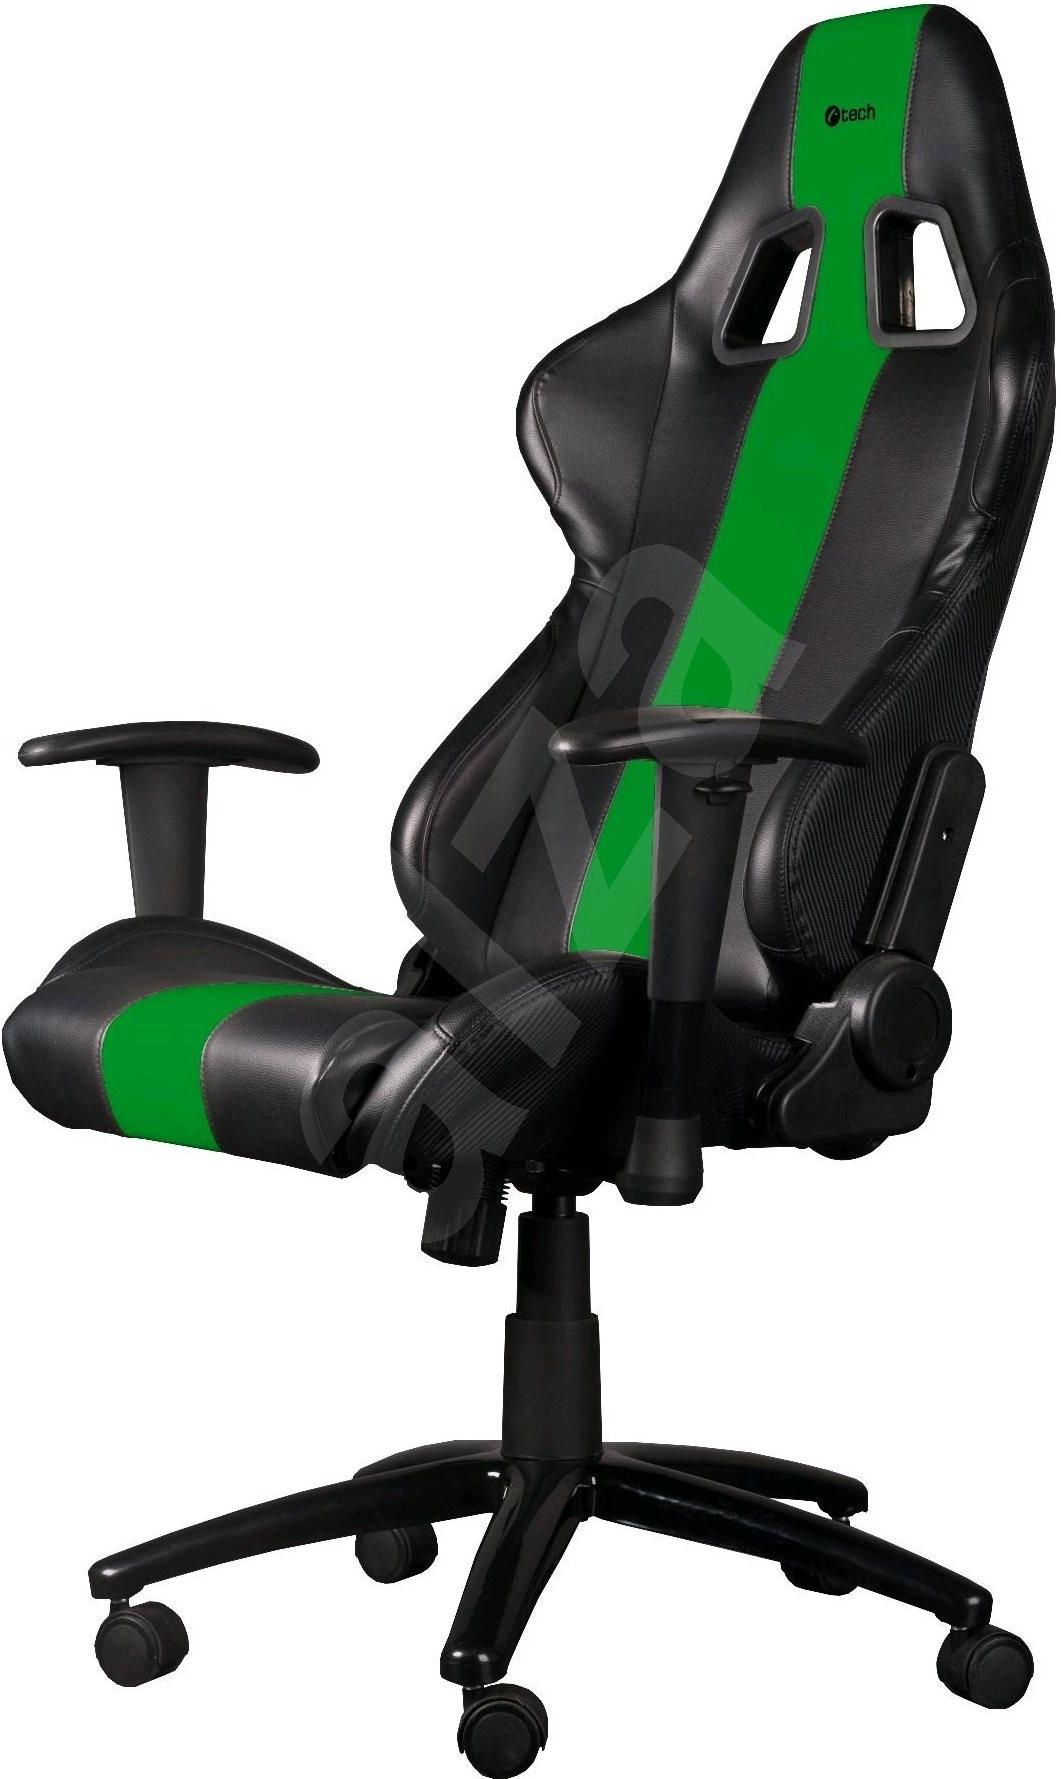 c tech phobos schwarz und gr n gaming st hle. Black Bedroom Furniture Sets. Home Design Ideas